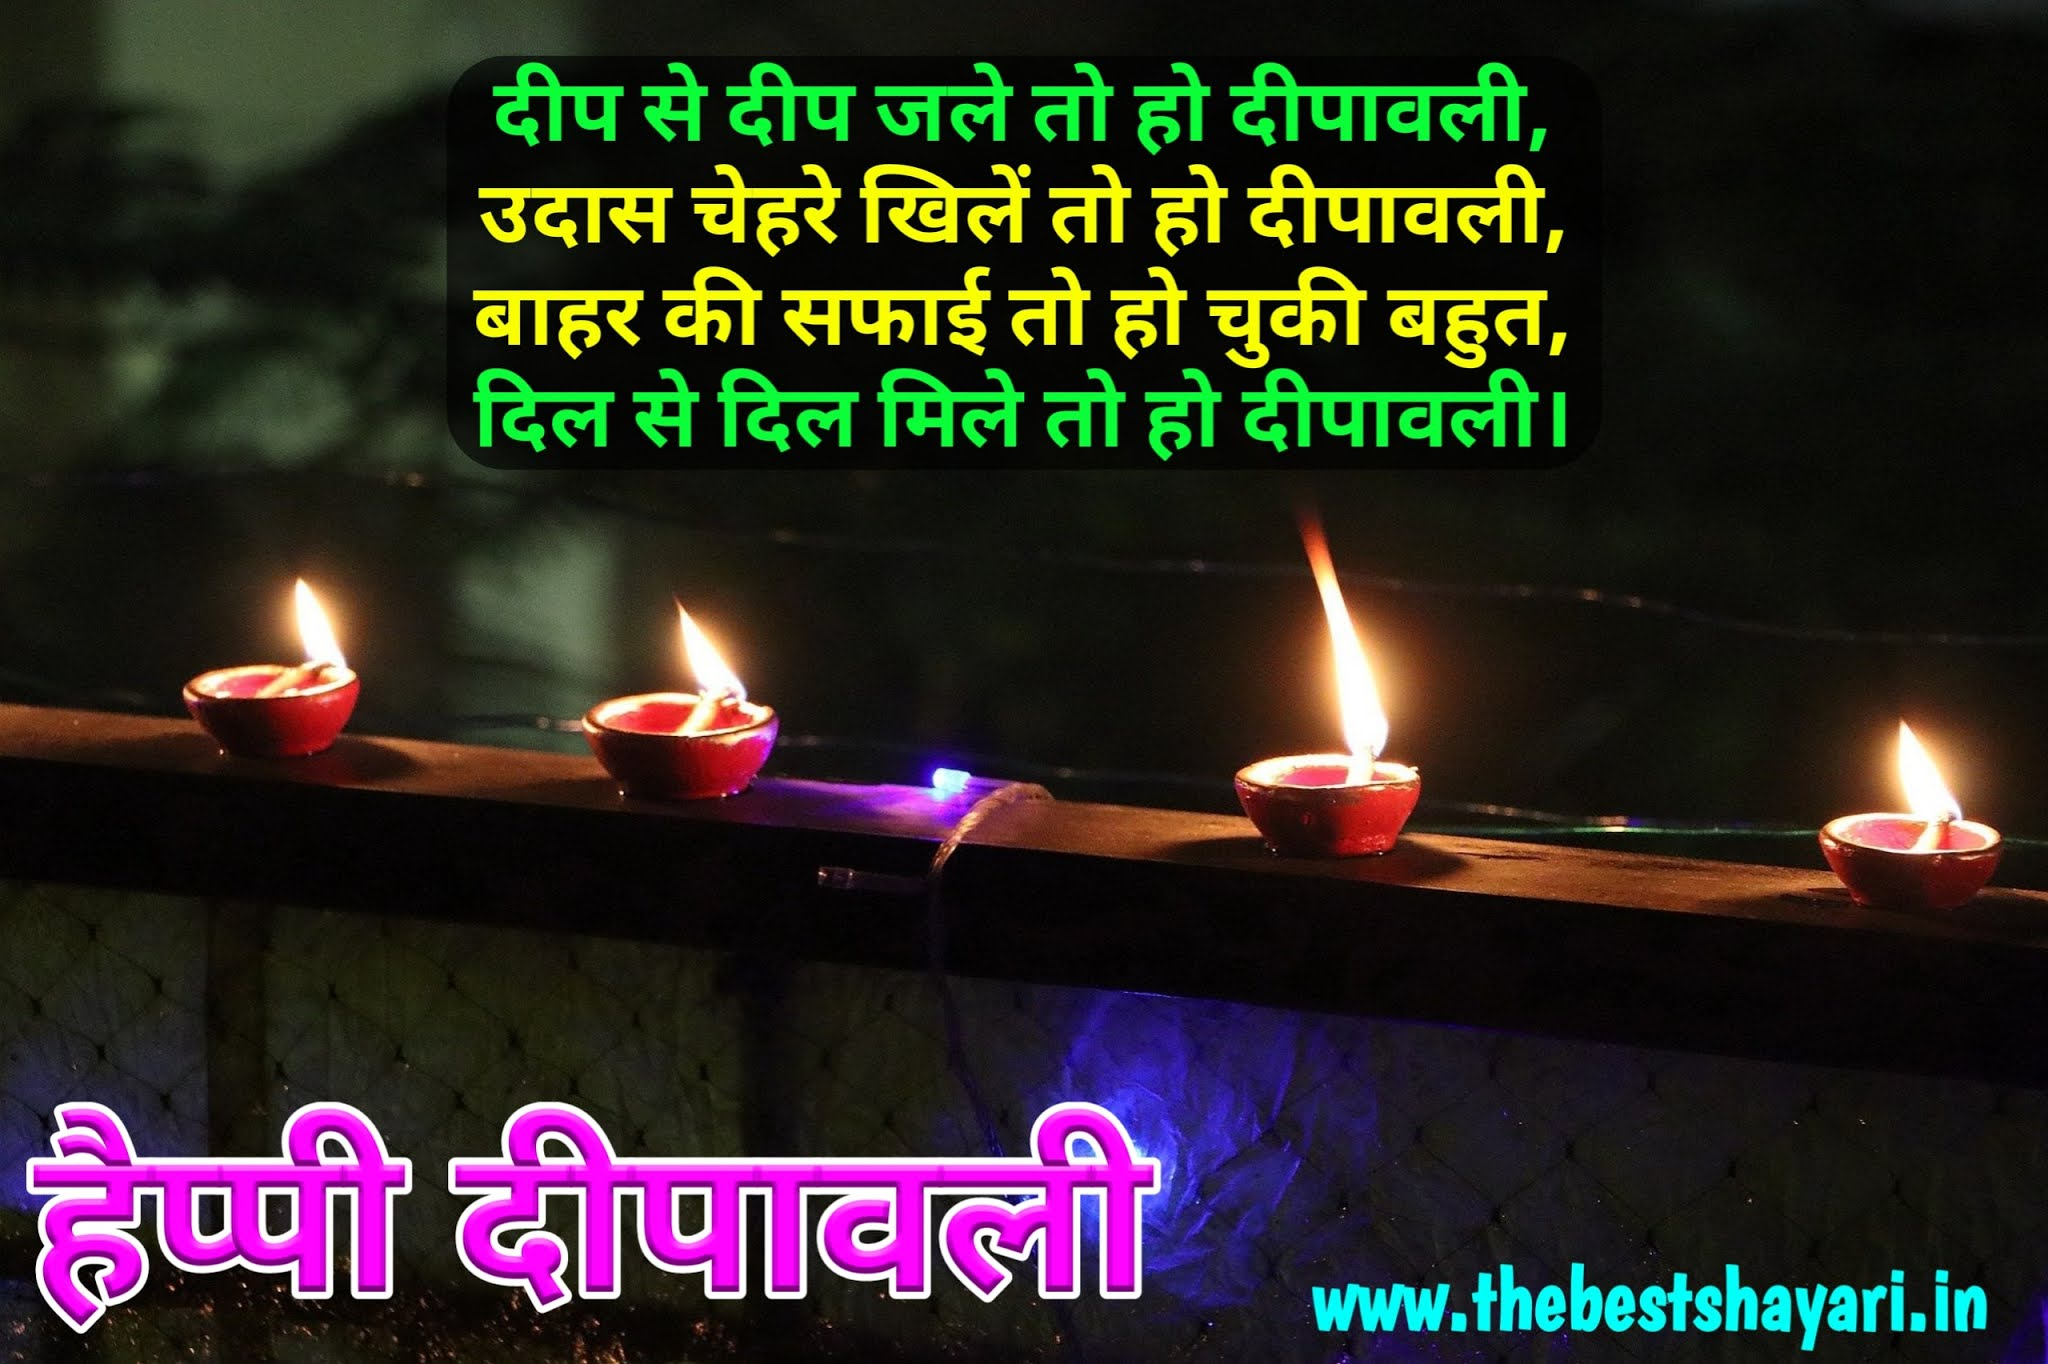 diwali wishes hd